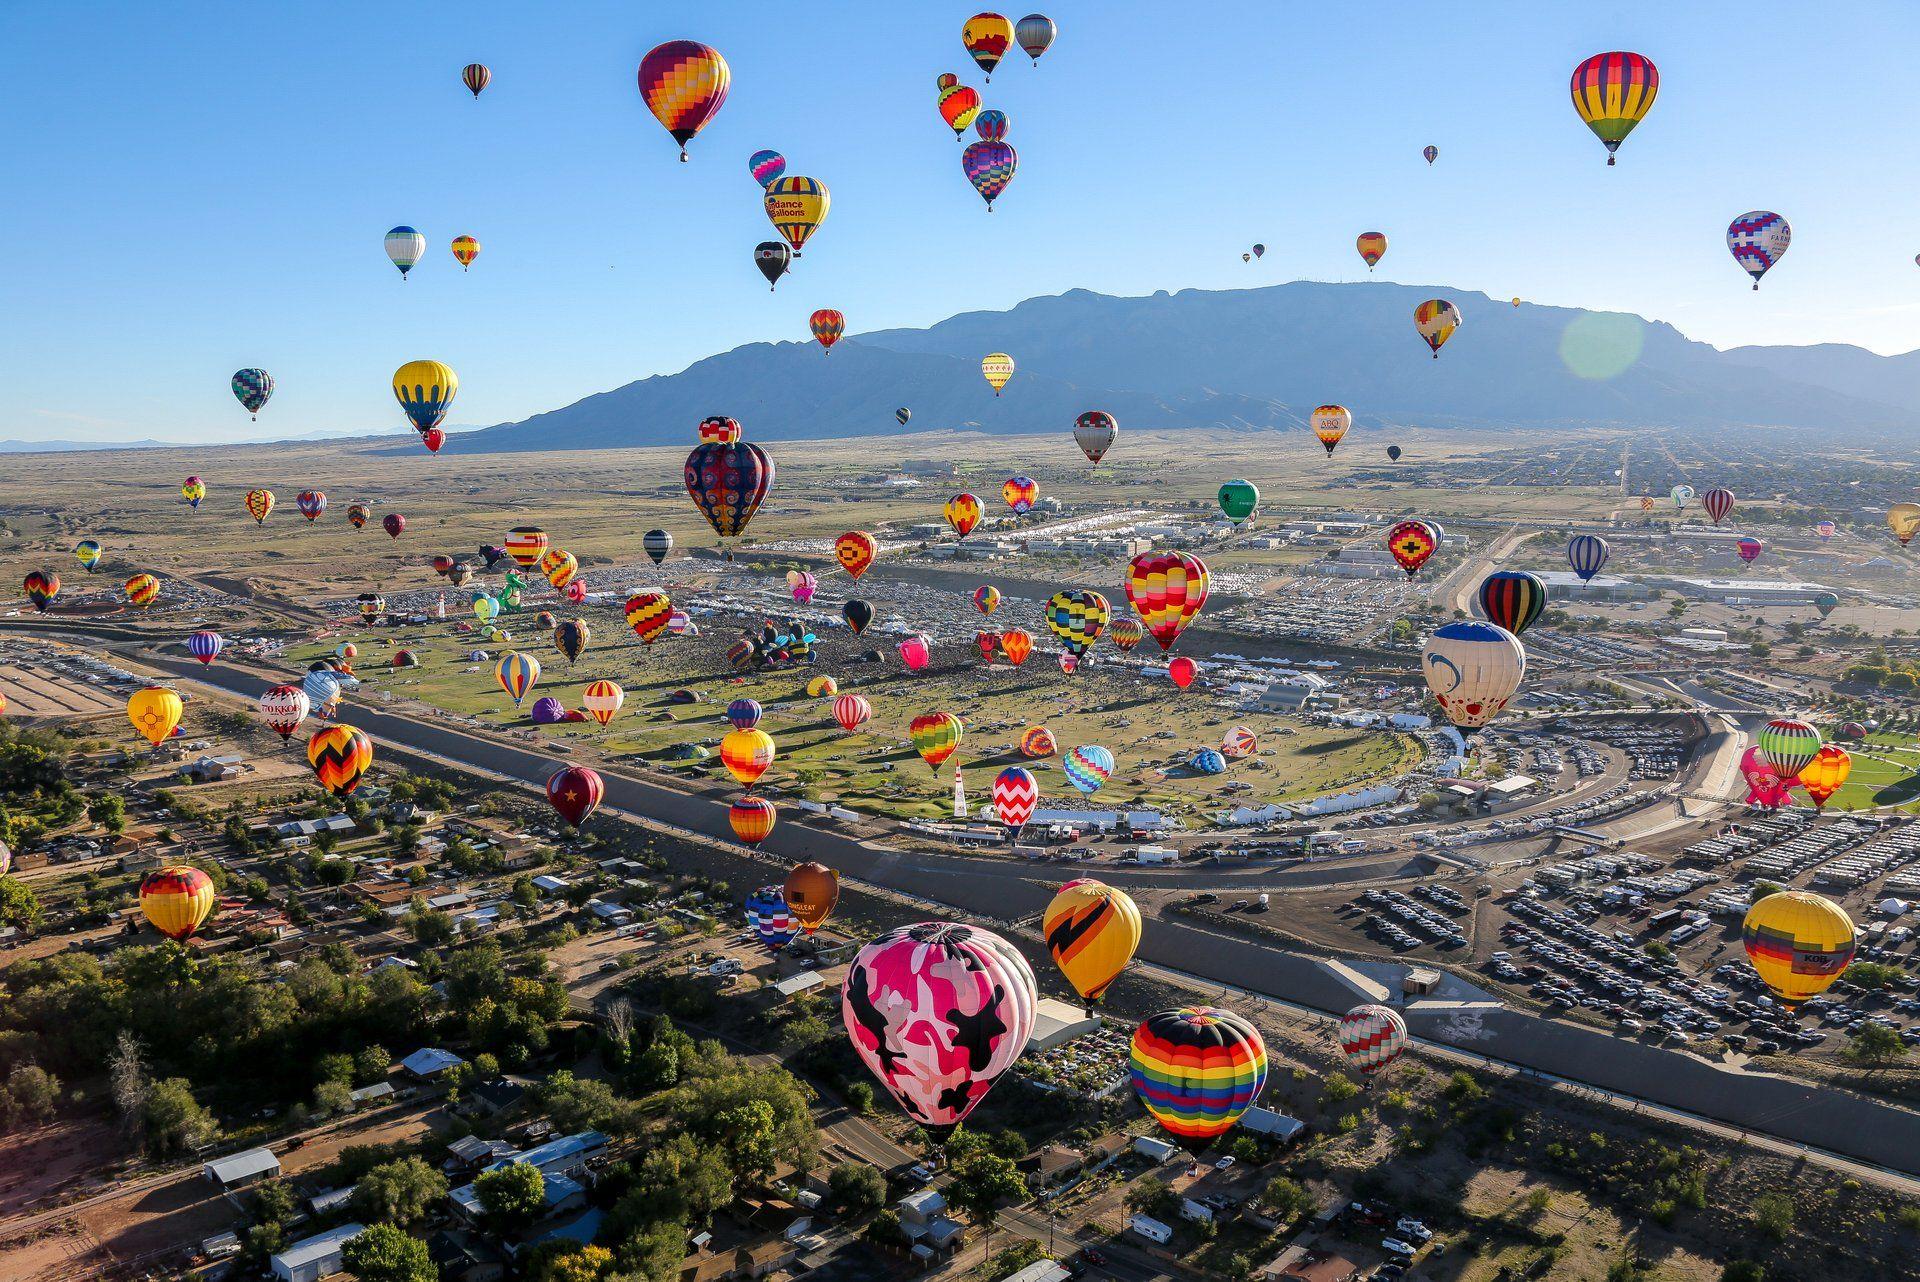 Albuquerque International Balloon Fiesta 2020 in New